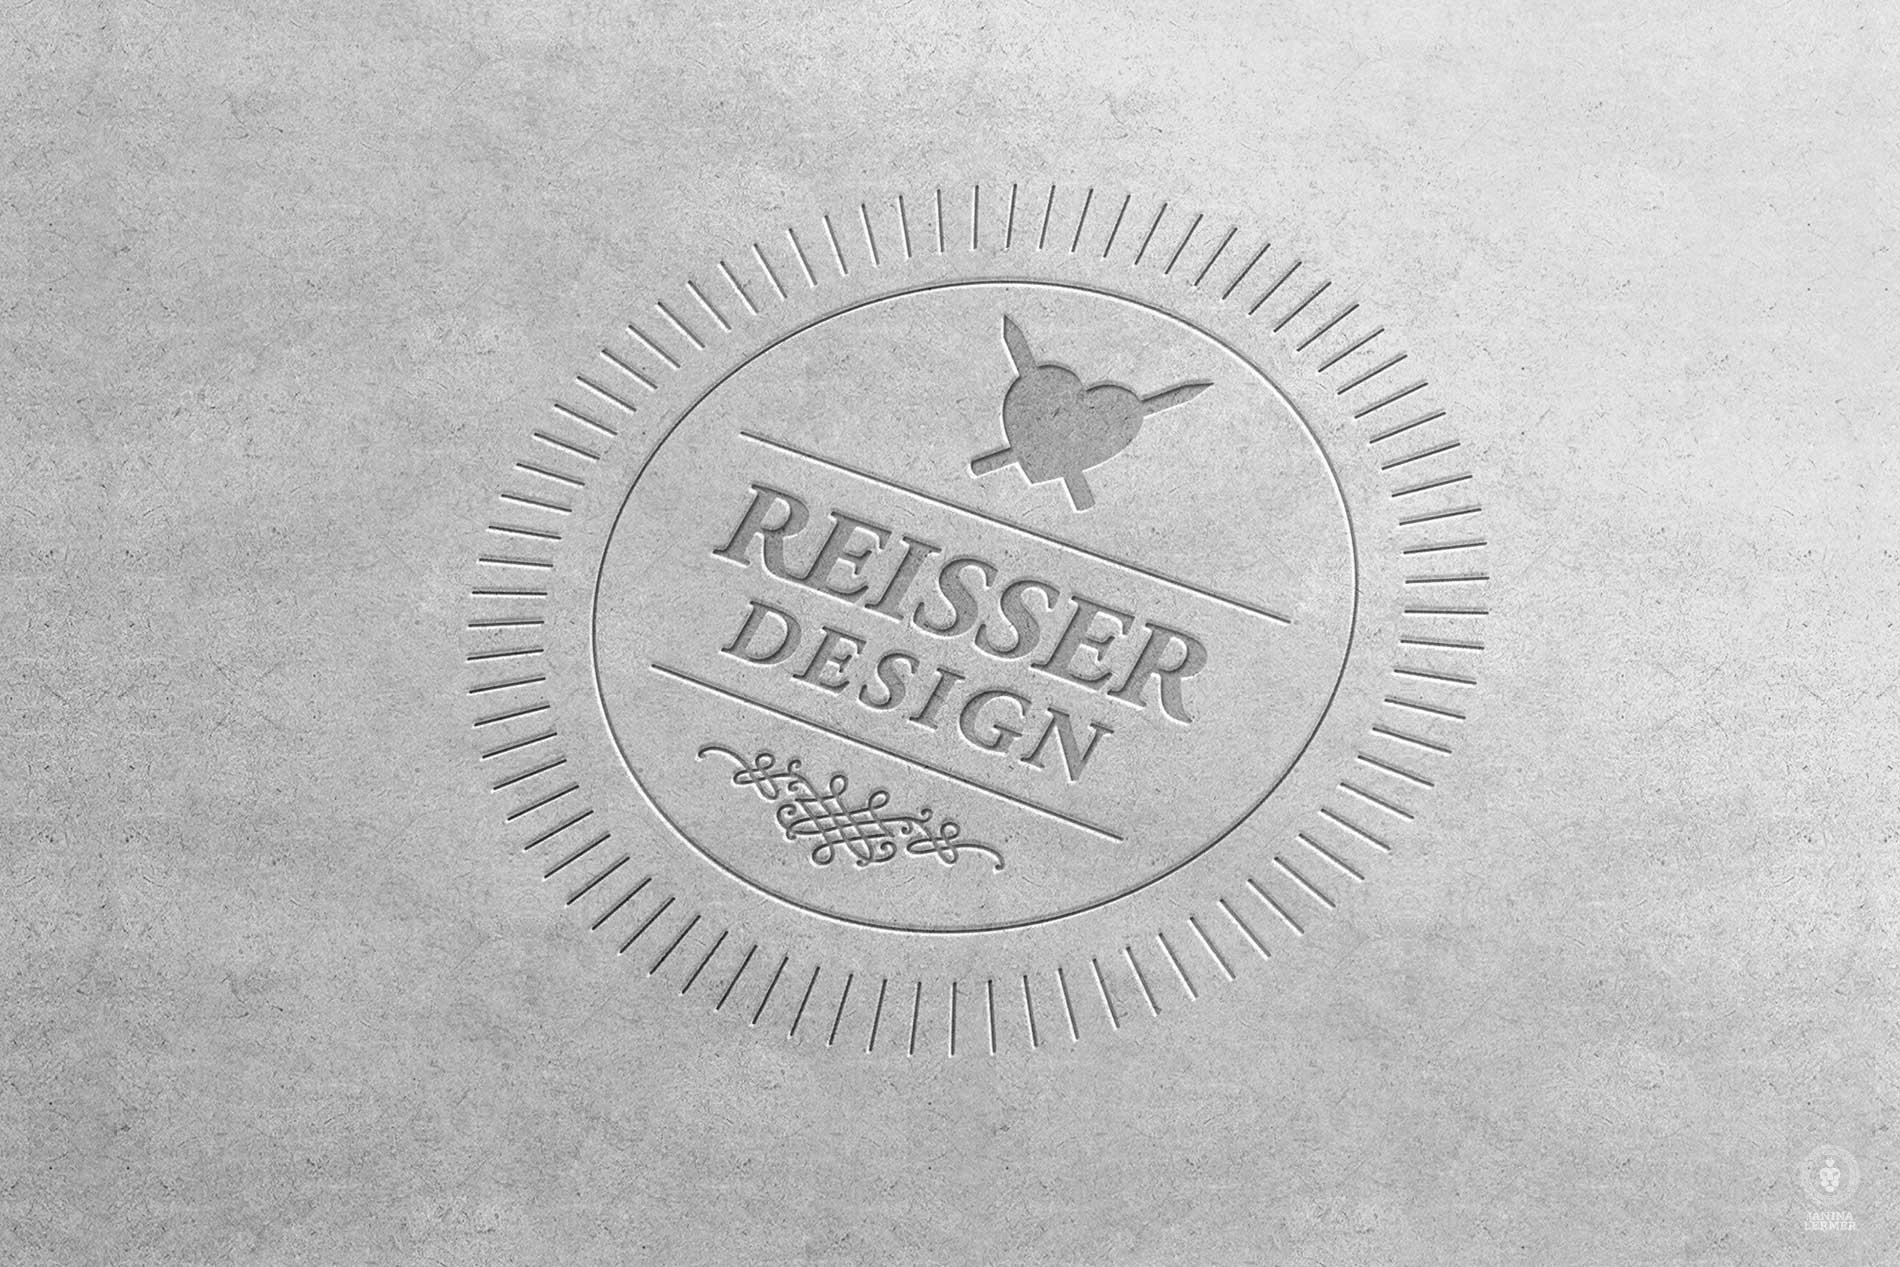 Janina-Lermer-Markengestaltung-Branddesign-Corporate-Design-Reisserdesign-Logo